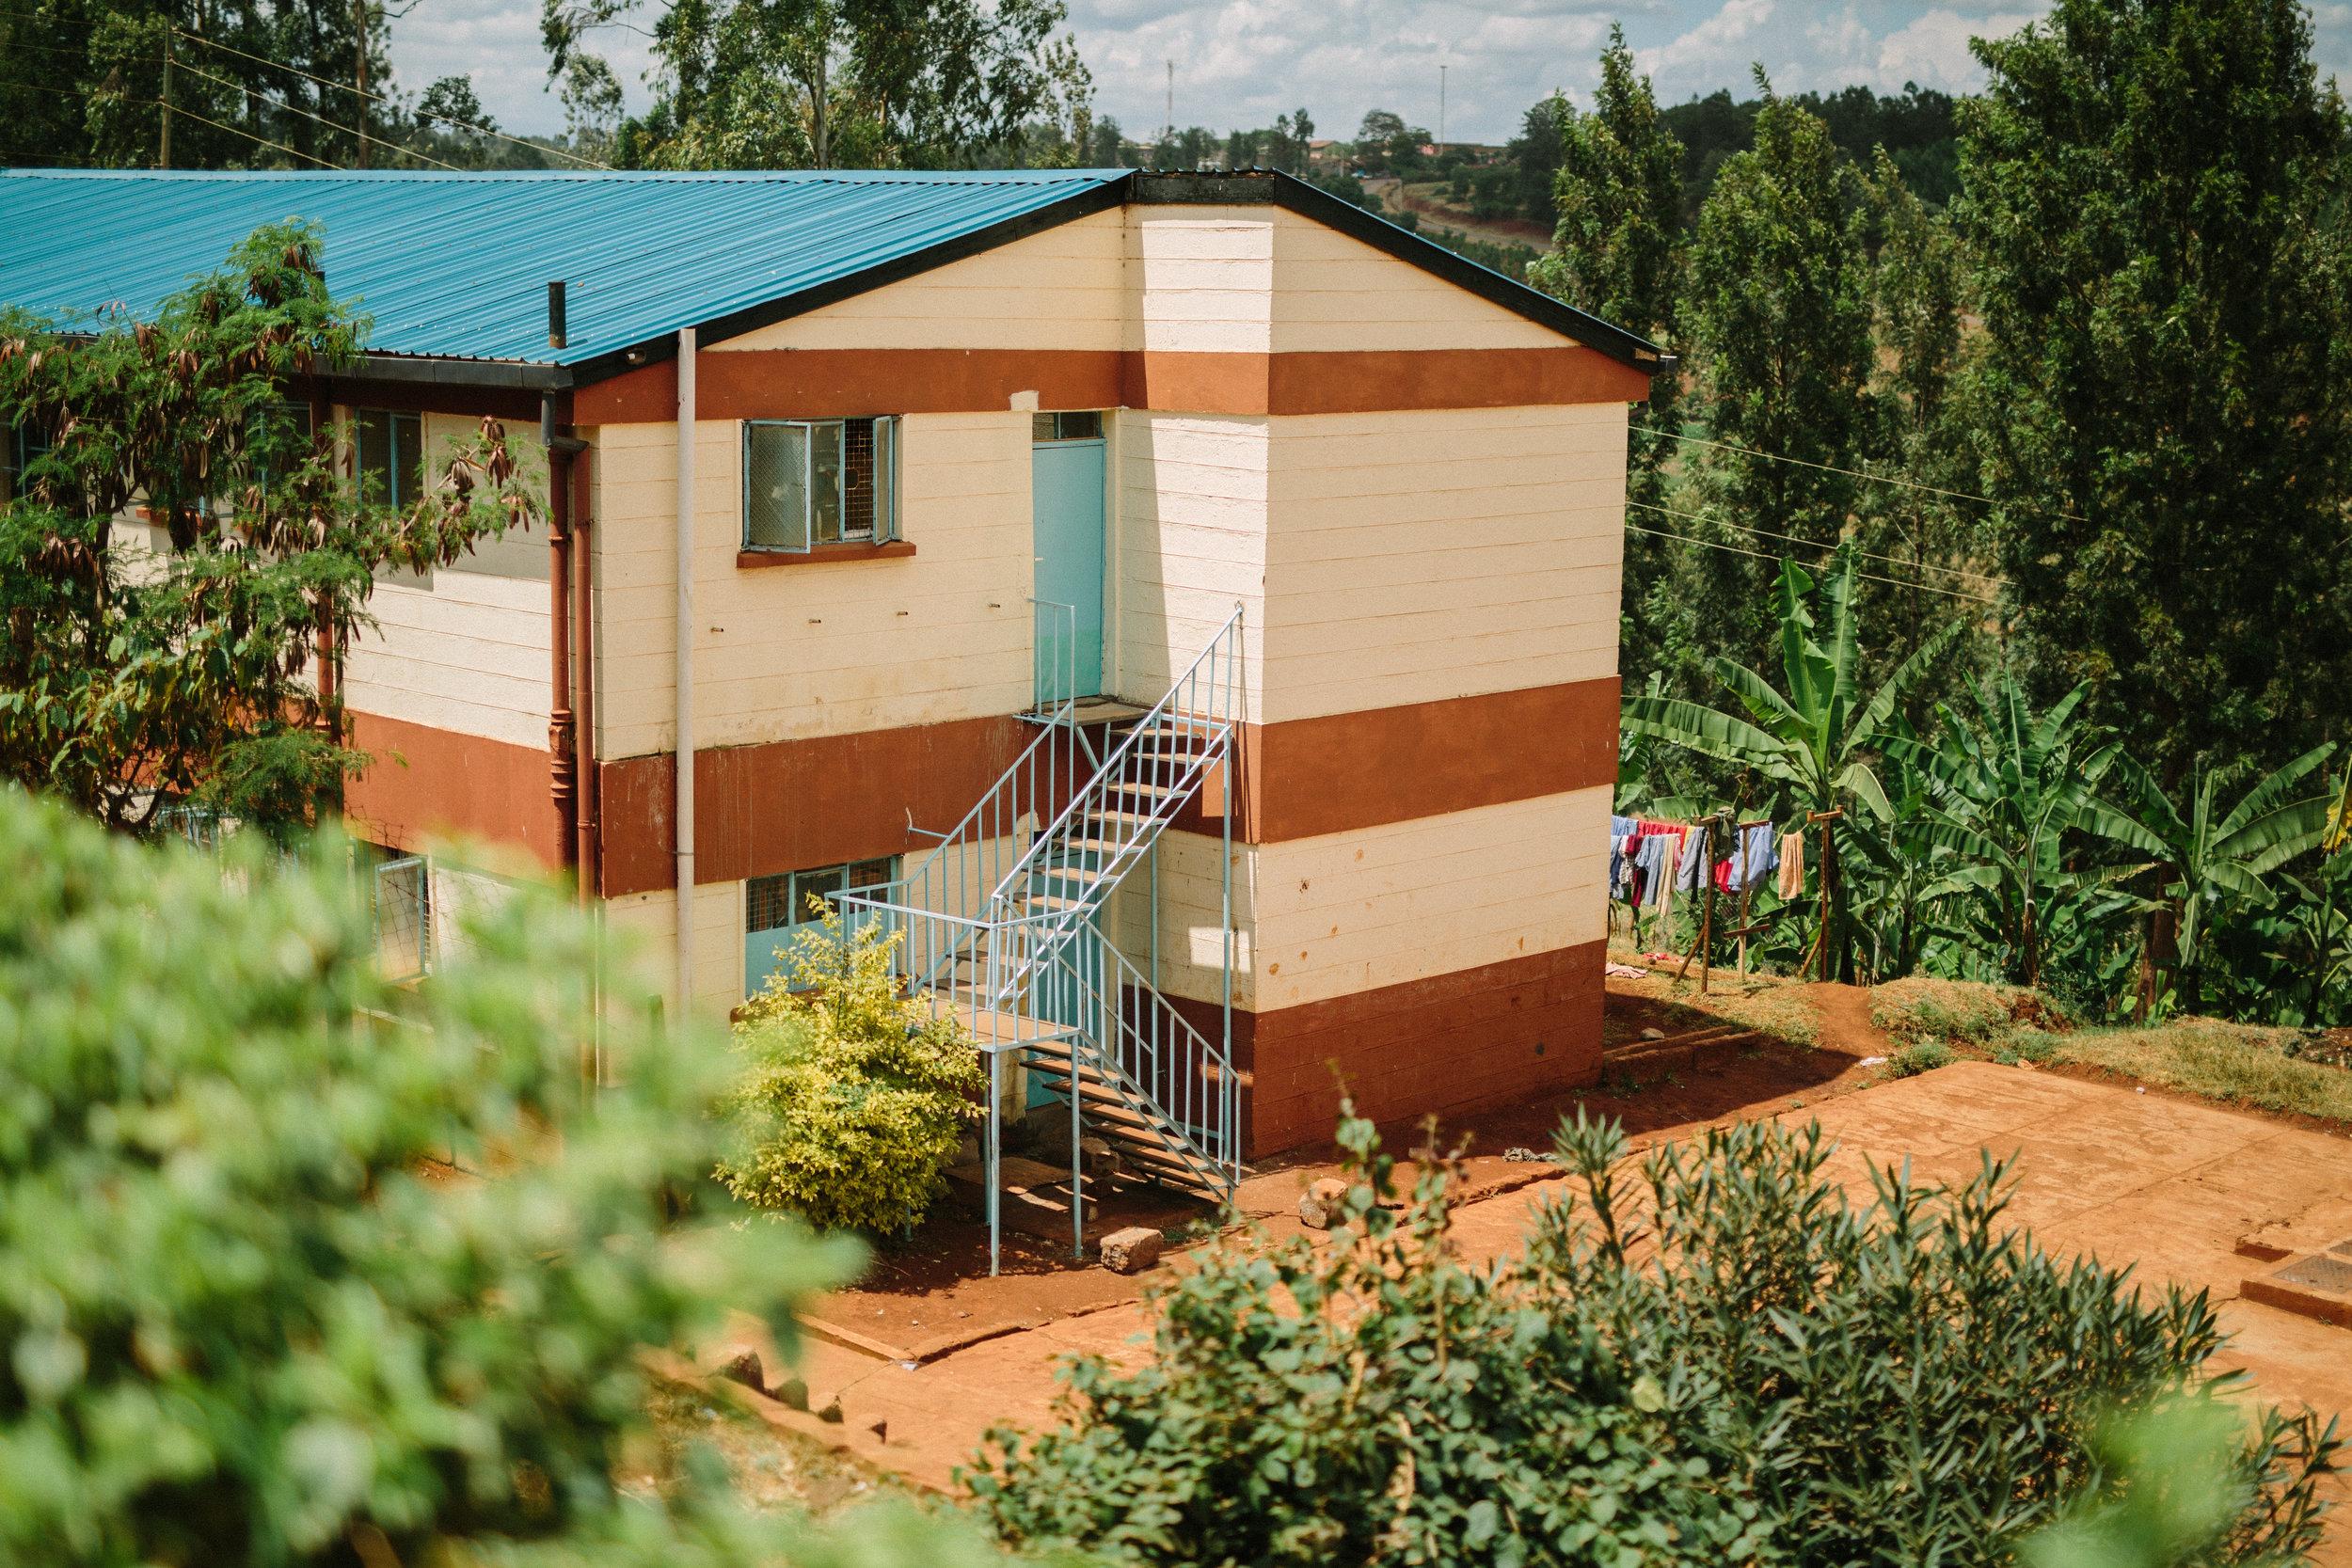 Kambui Primary School